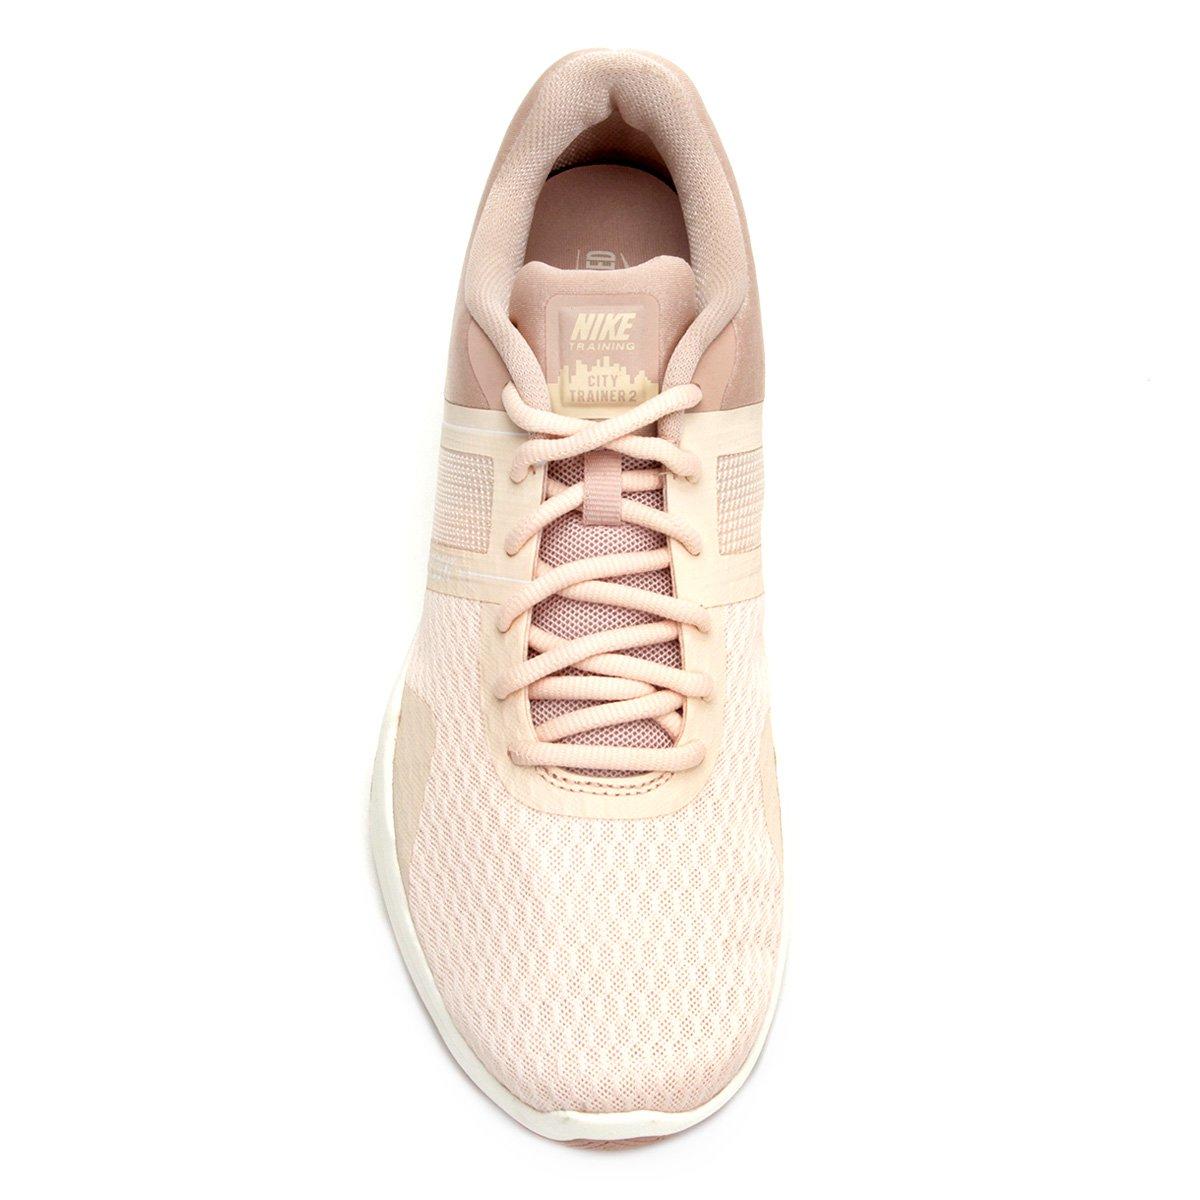 8f05eaa13b Tênis Nike City Trainer 2 Feminino - Bege - Compre Agora